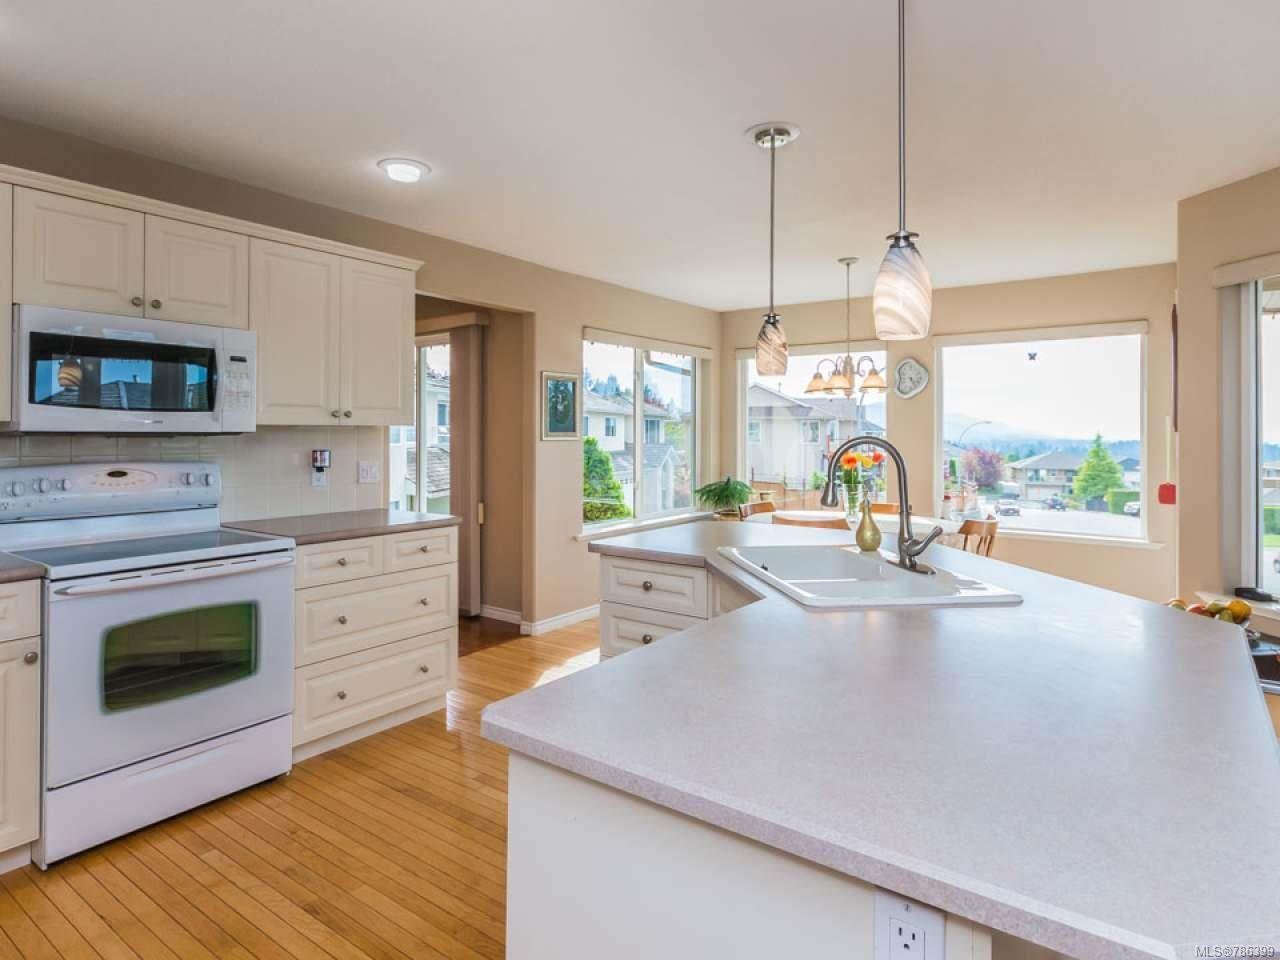 Photo 3: Photos: 5371 HIGHRIDGE PLACE in NANAIMO: Na North Nanaimo House for sale (Nanaimo)  : MLS®# 786399